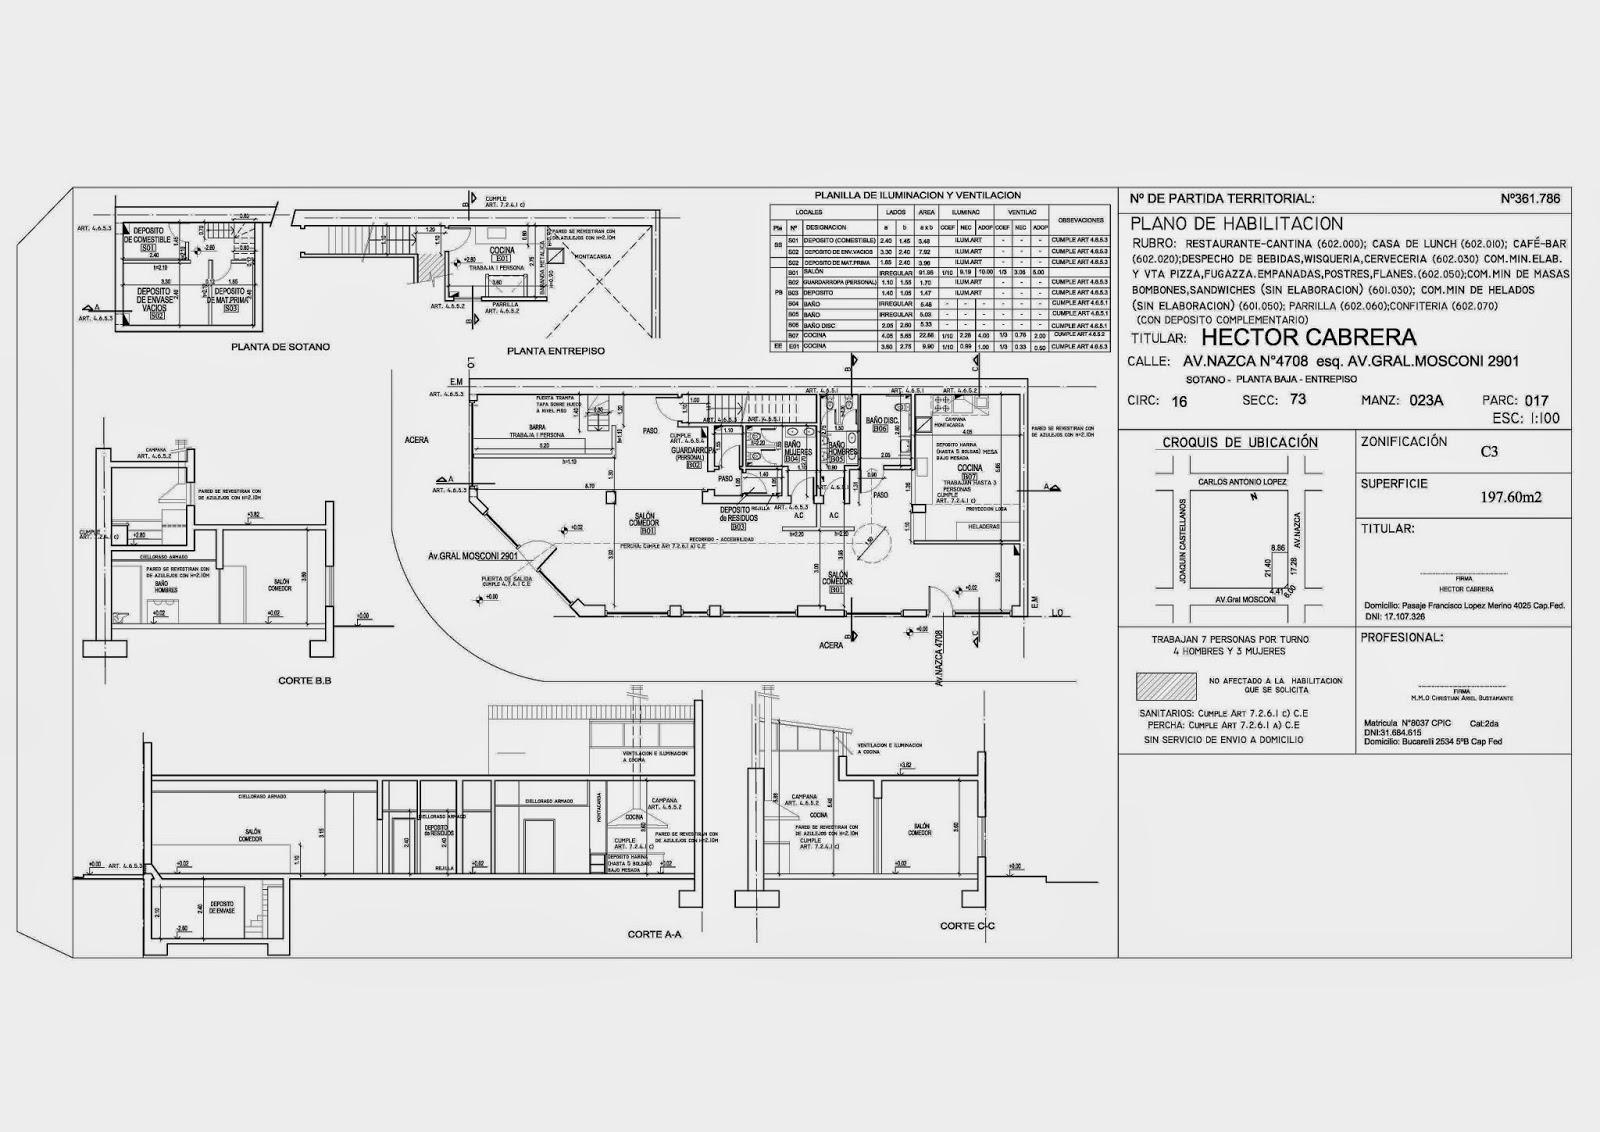 Ultra arquitectura plano de habilitacion comercial for Planos para restaurantes